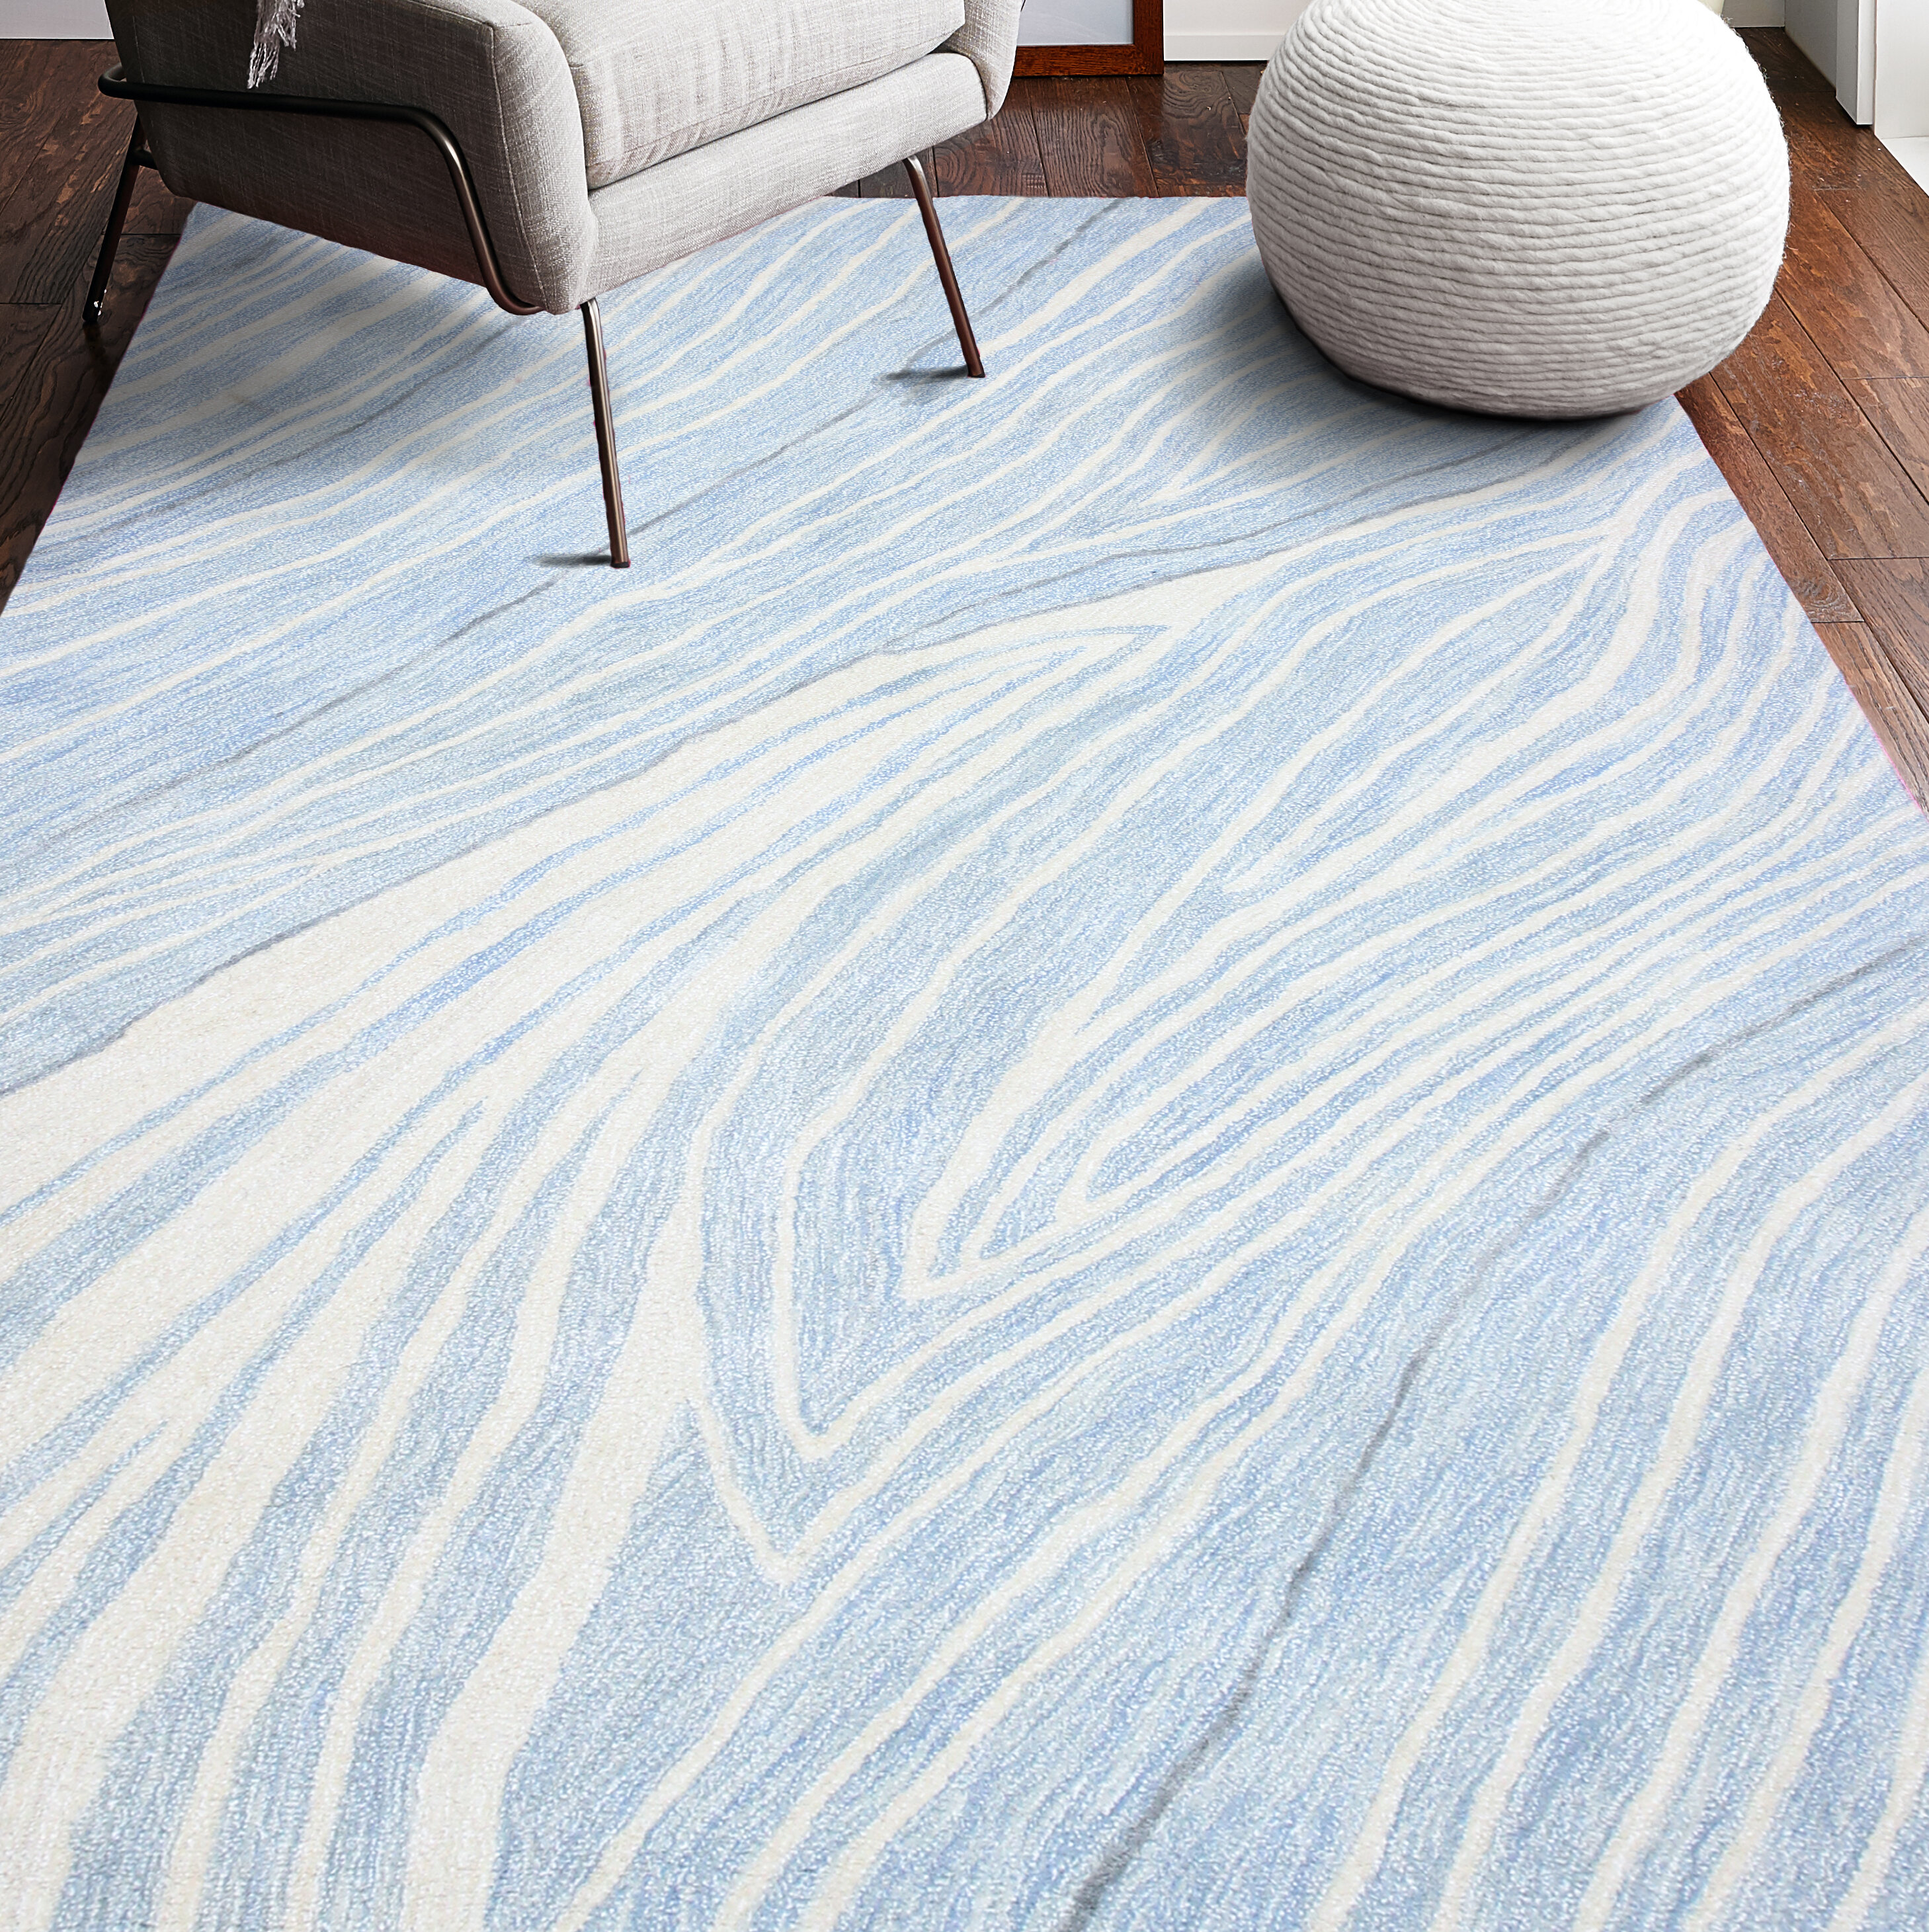 Ebern Designs Mcdiarmid Artsilk Hand Tufted Light Blue Area Rug Reviews Wayfair